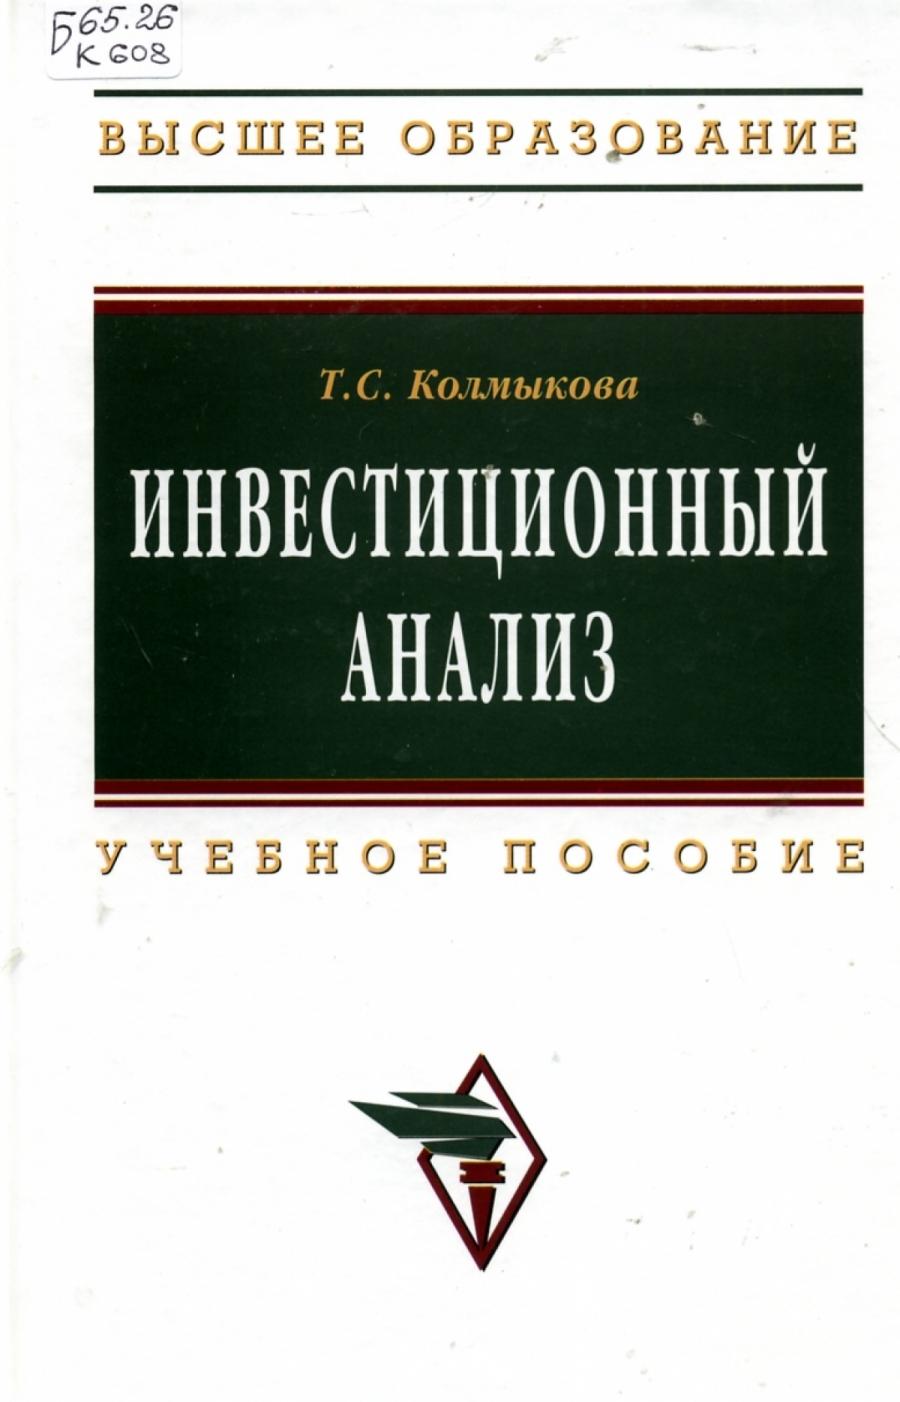 Обложка книги:  колмыкова т.с. - инвестиционный анализ